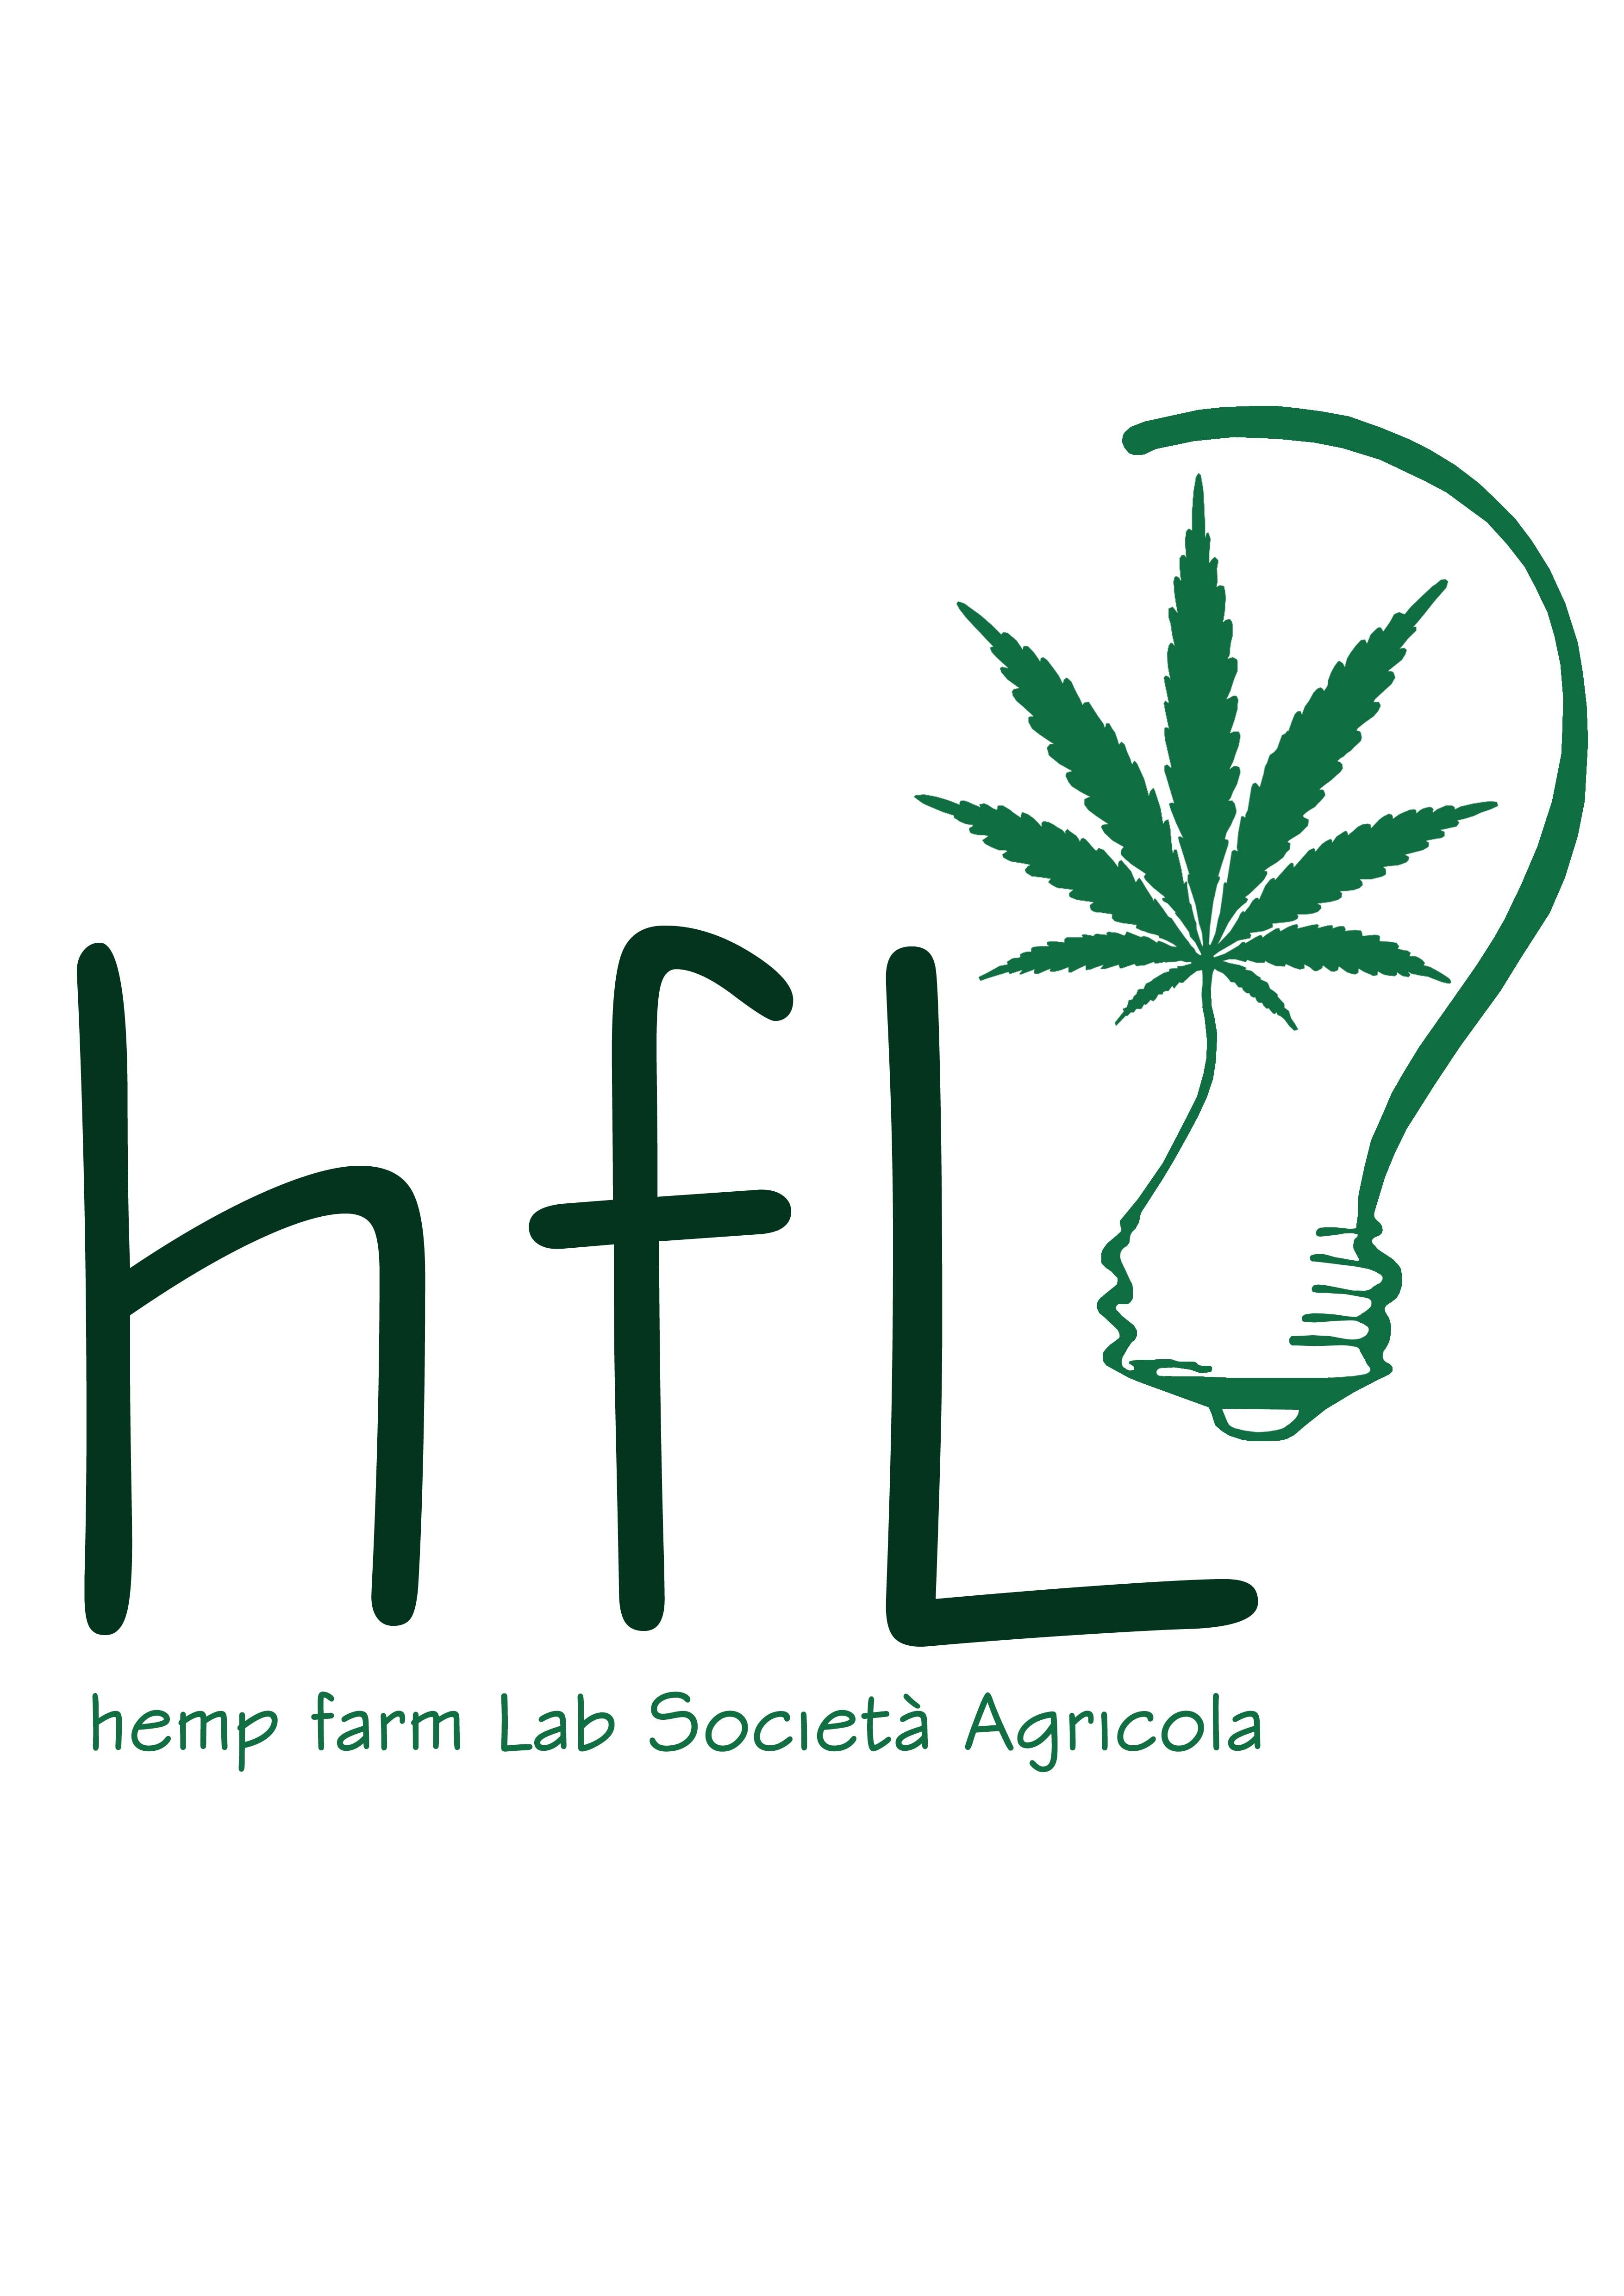 hemp Farm Lab